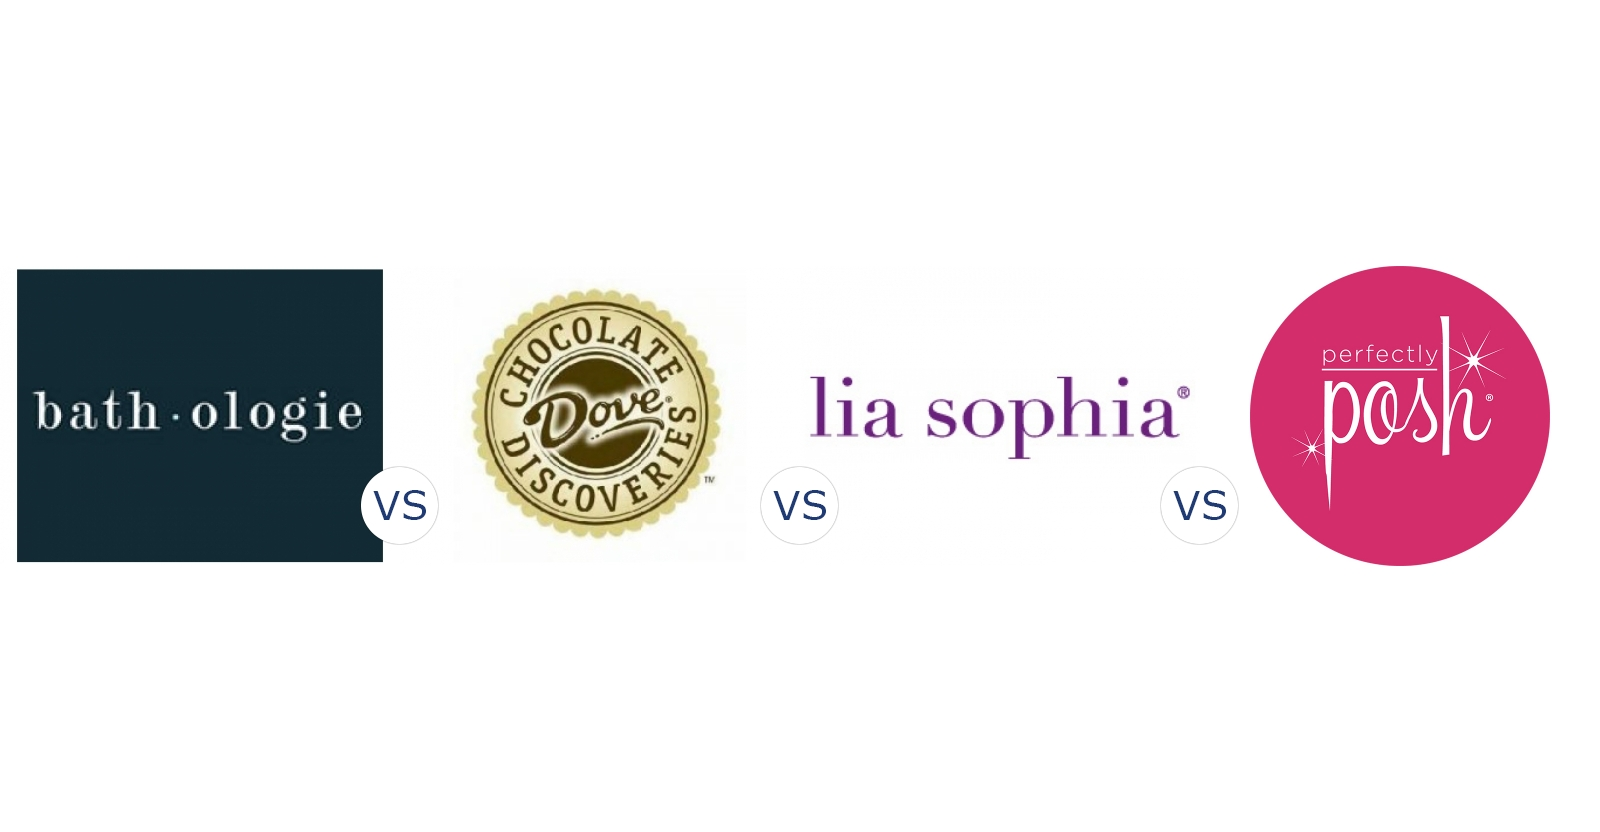 Bathologie vs. Dove Chocolate Discoveries vs. Lia Sophia vs. Perfectly Posh